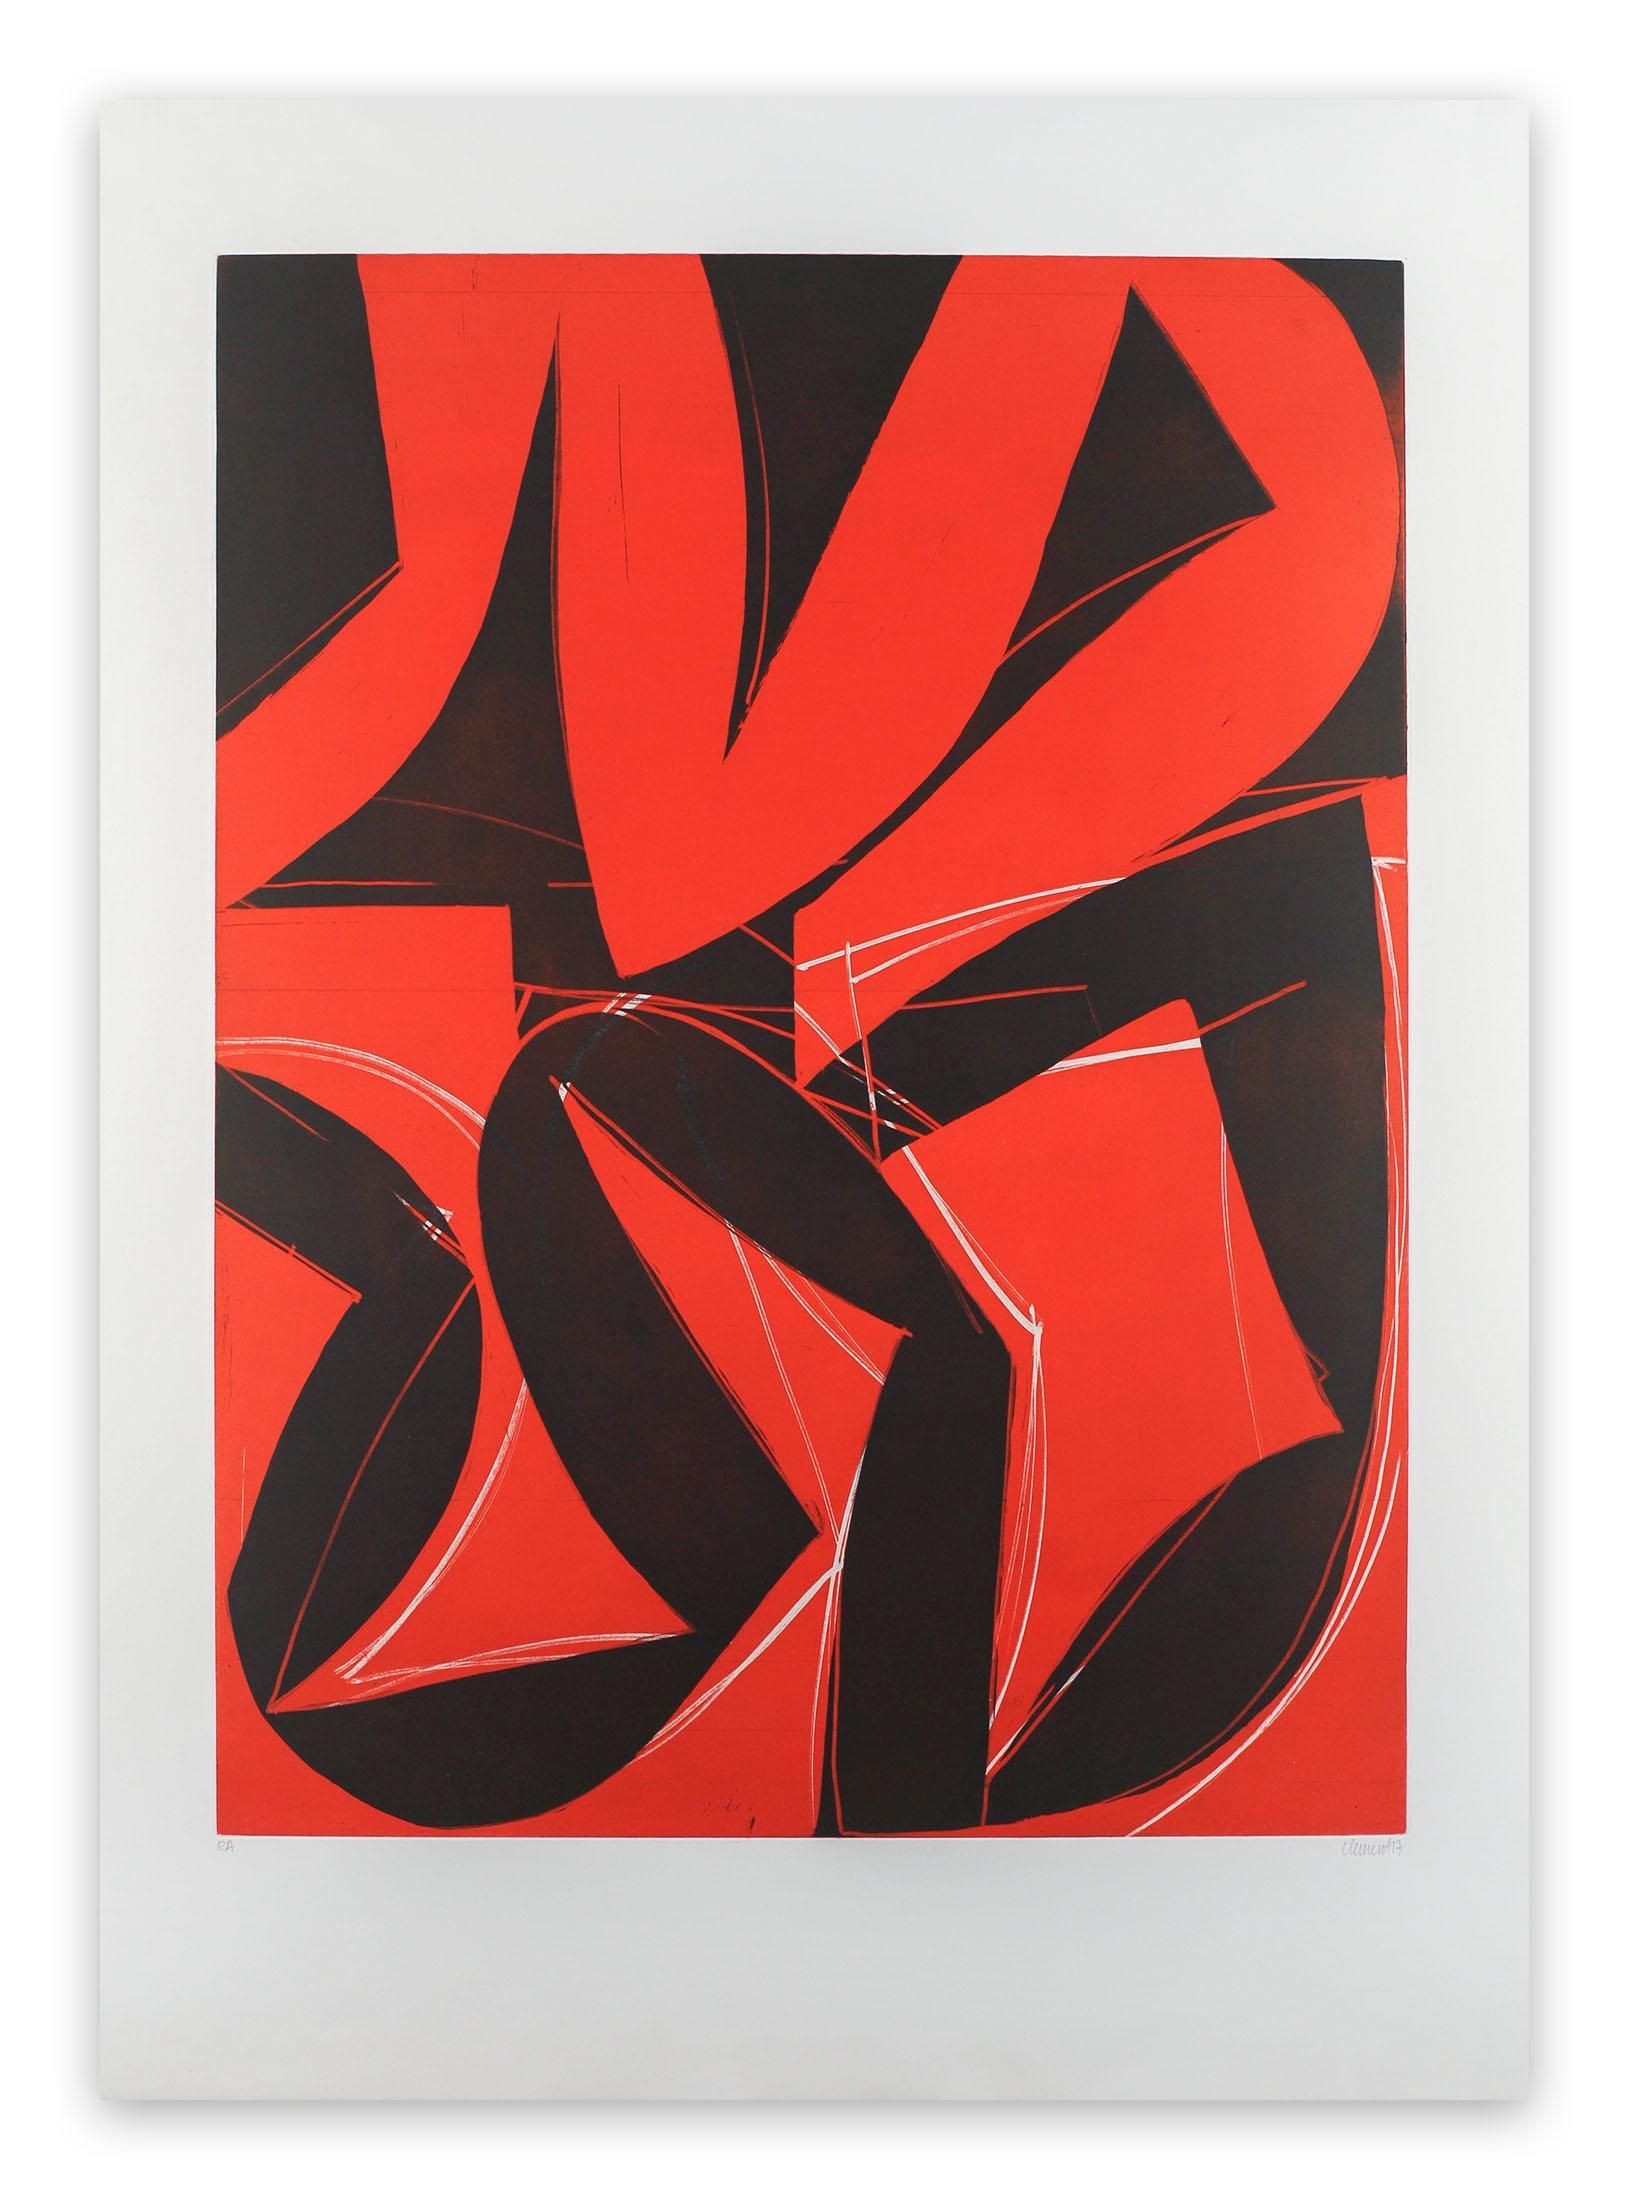 17M2G-2017 (Abstract print)